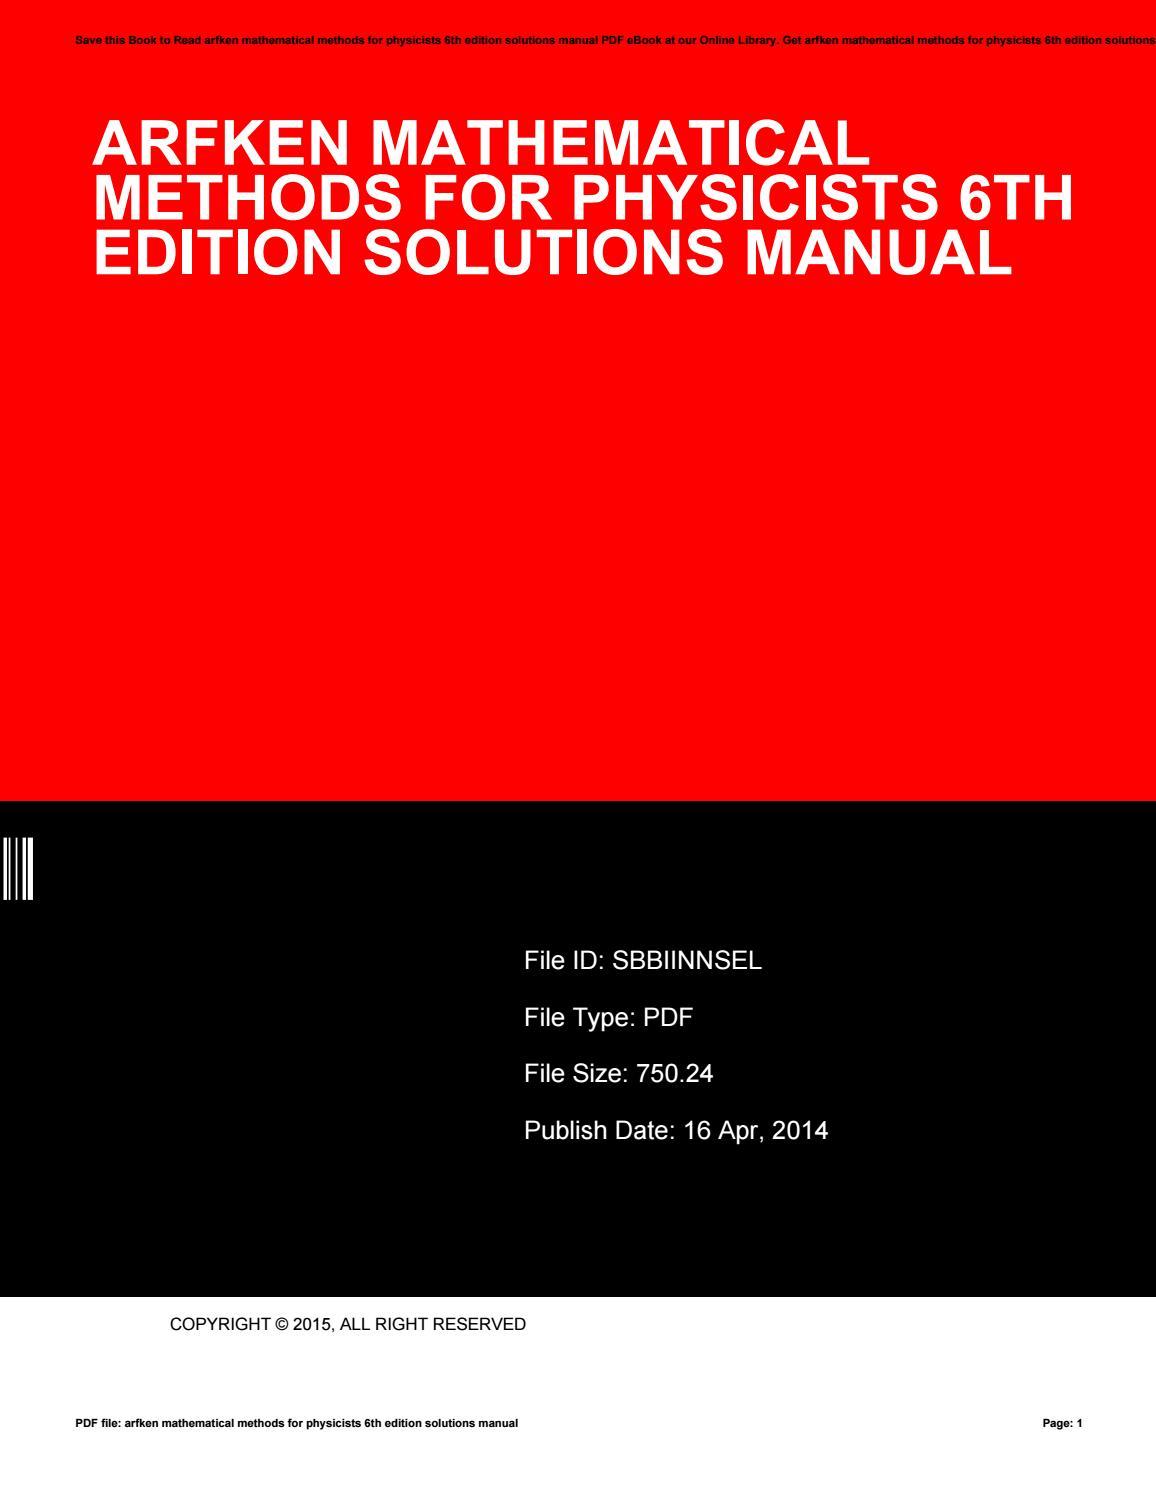 Arfken solution pdf 6th